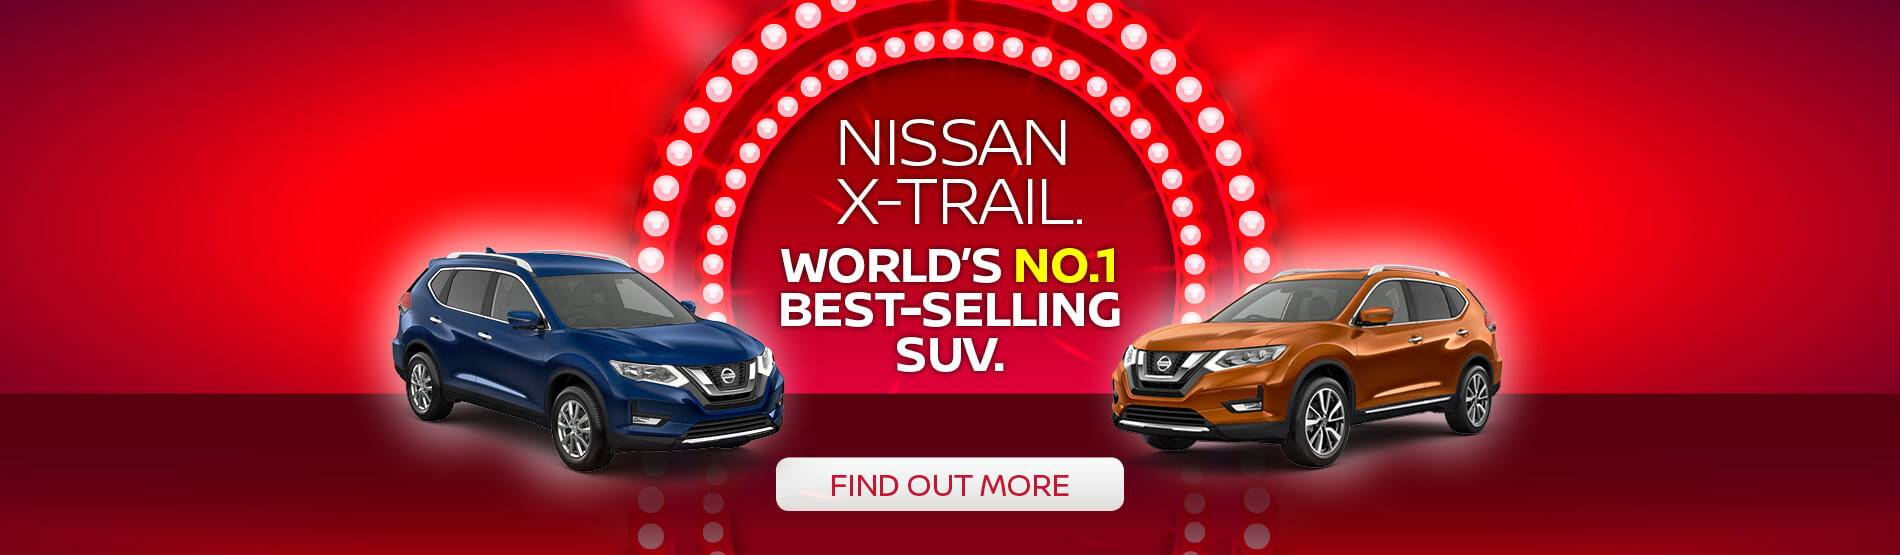 Mantello-Nissan-X-Trail